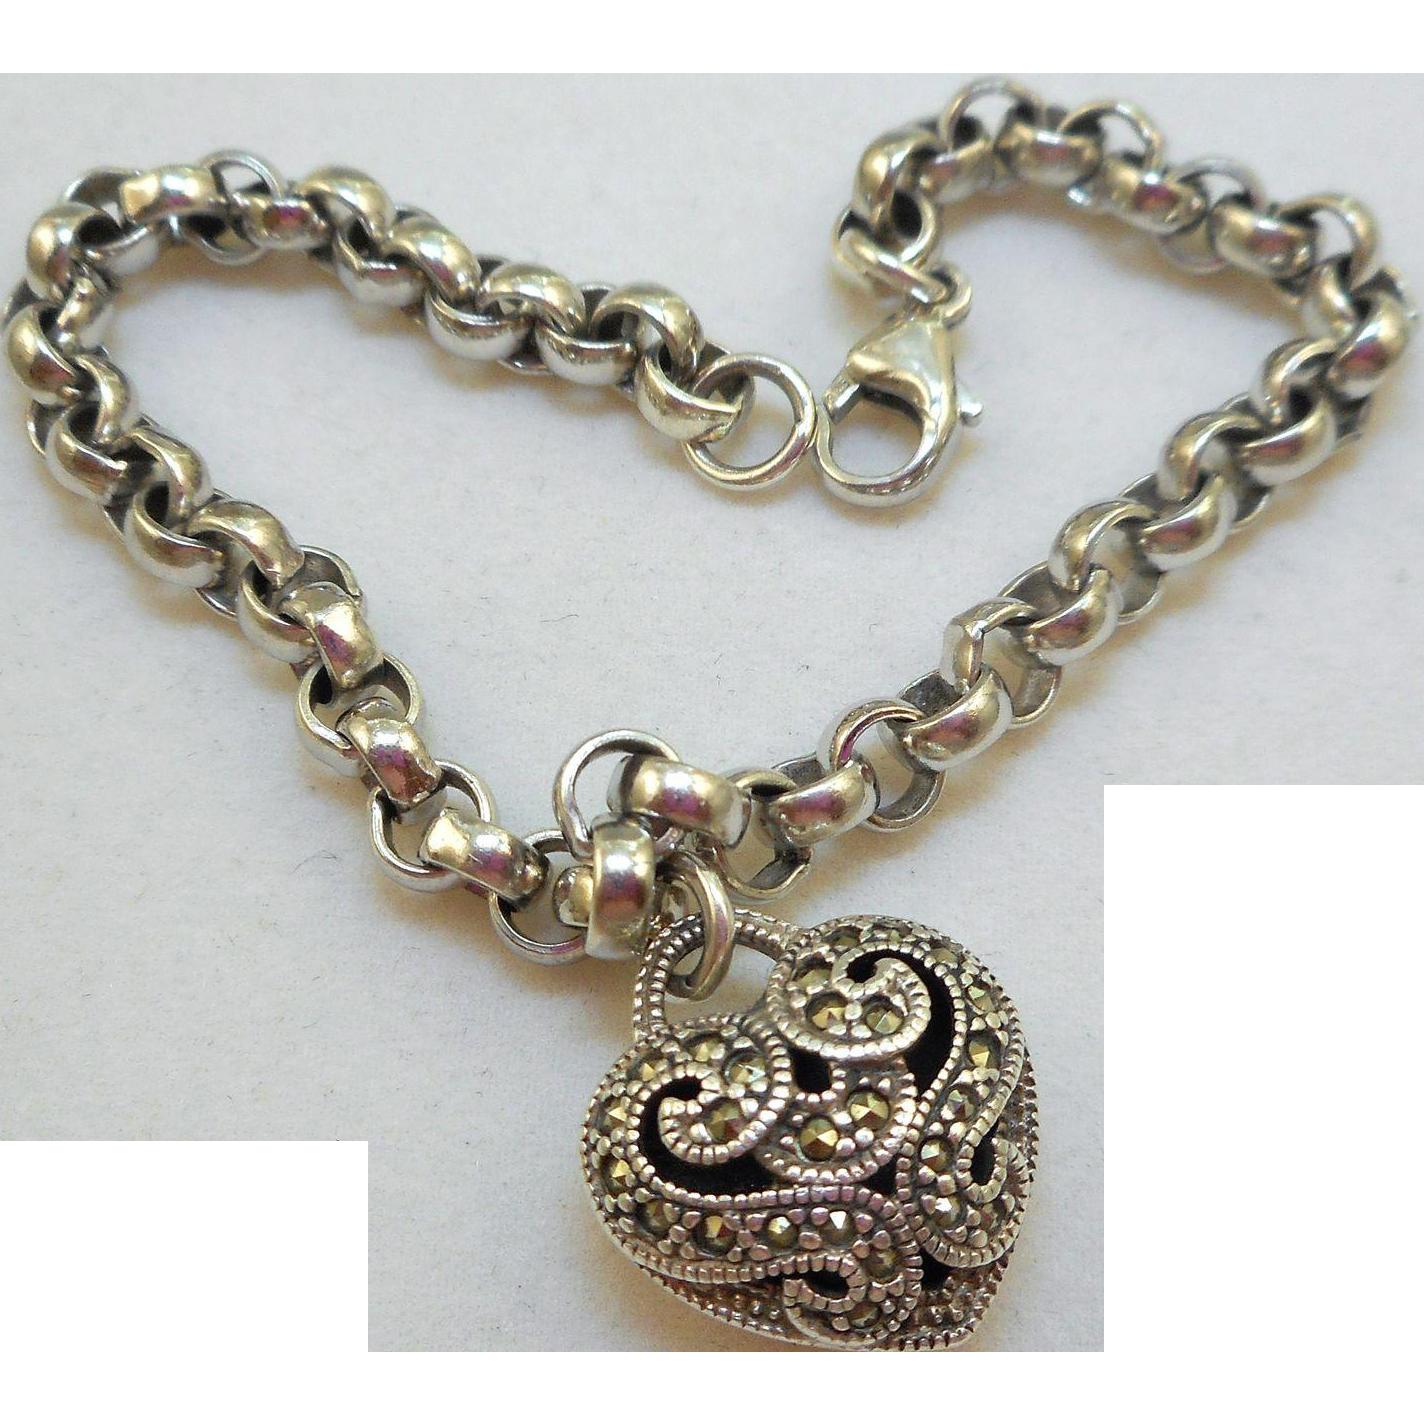 Judith Jack Heart Charm Bracelet from antiqueali on Ruby Lane